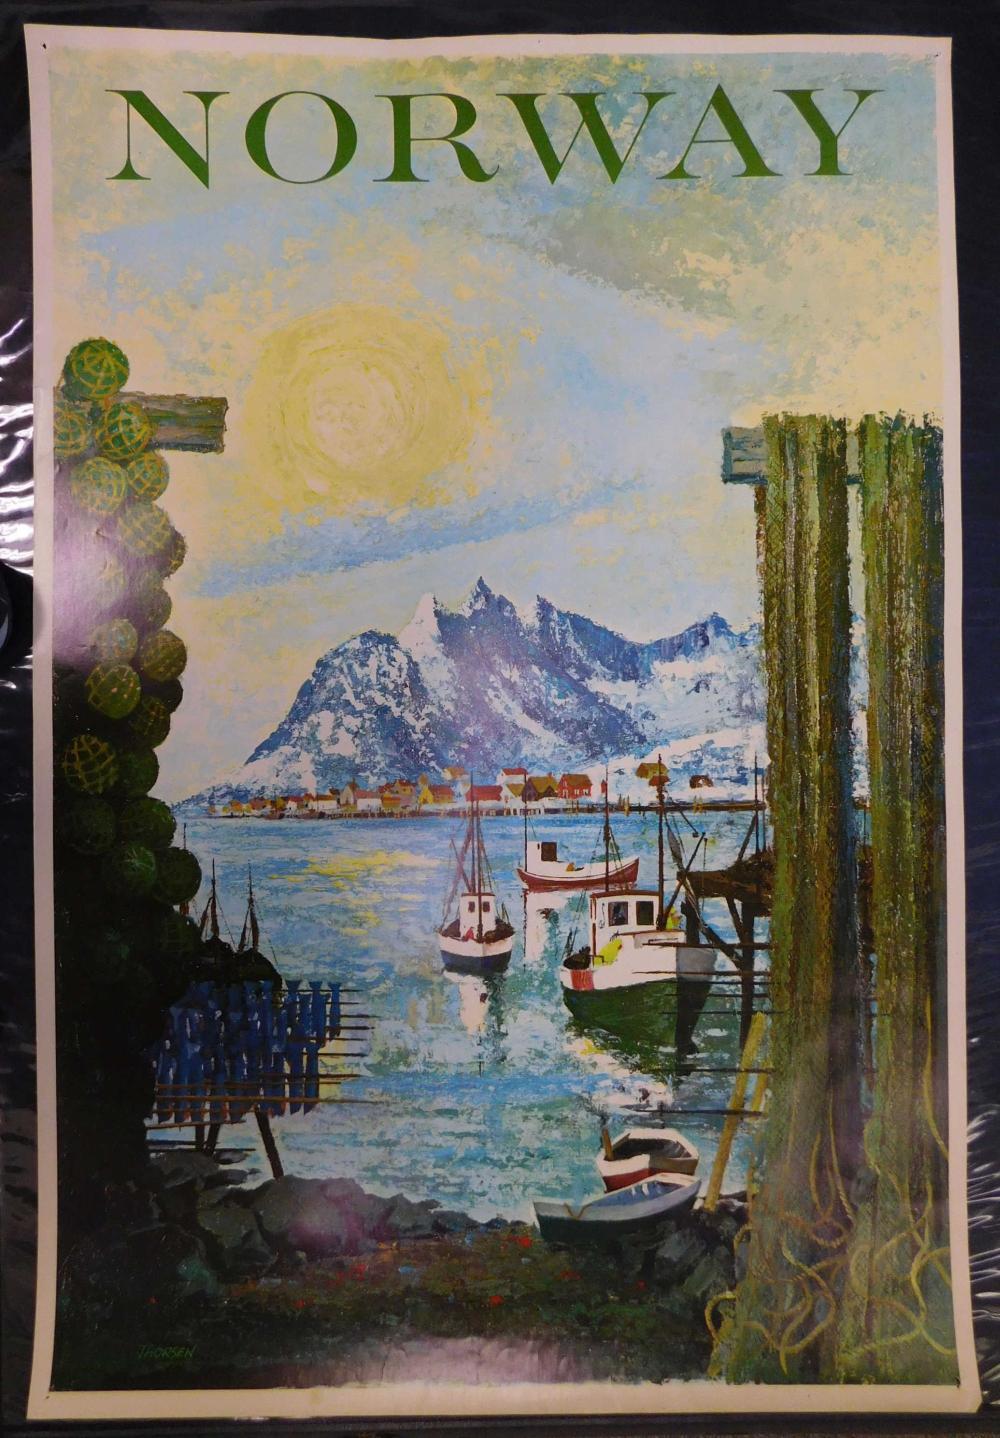 Vintage Travel Poster. Norway. Thorsen.